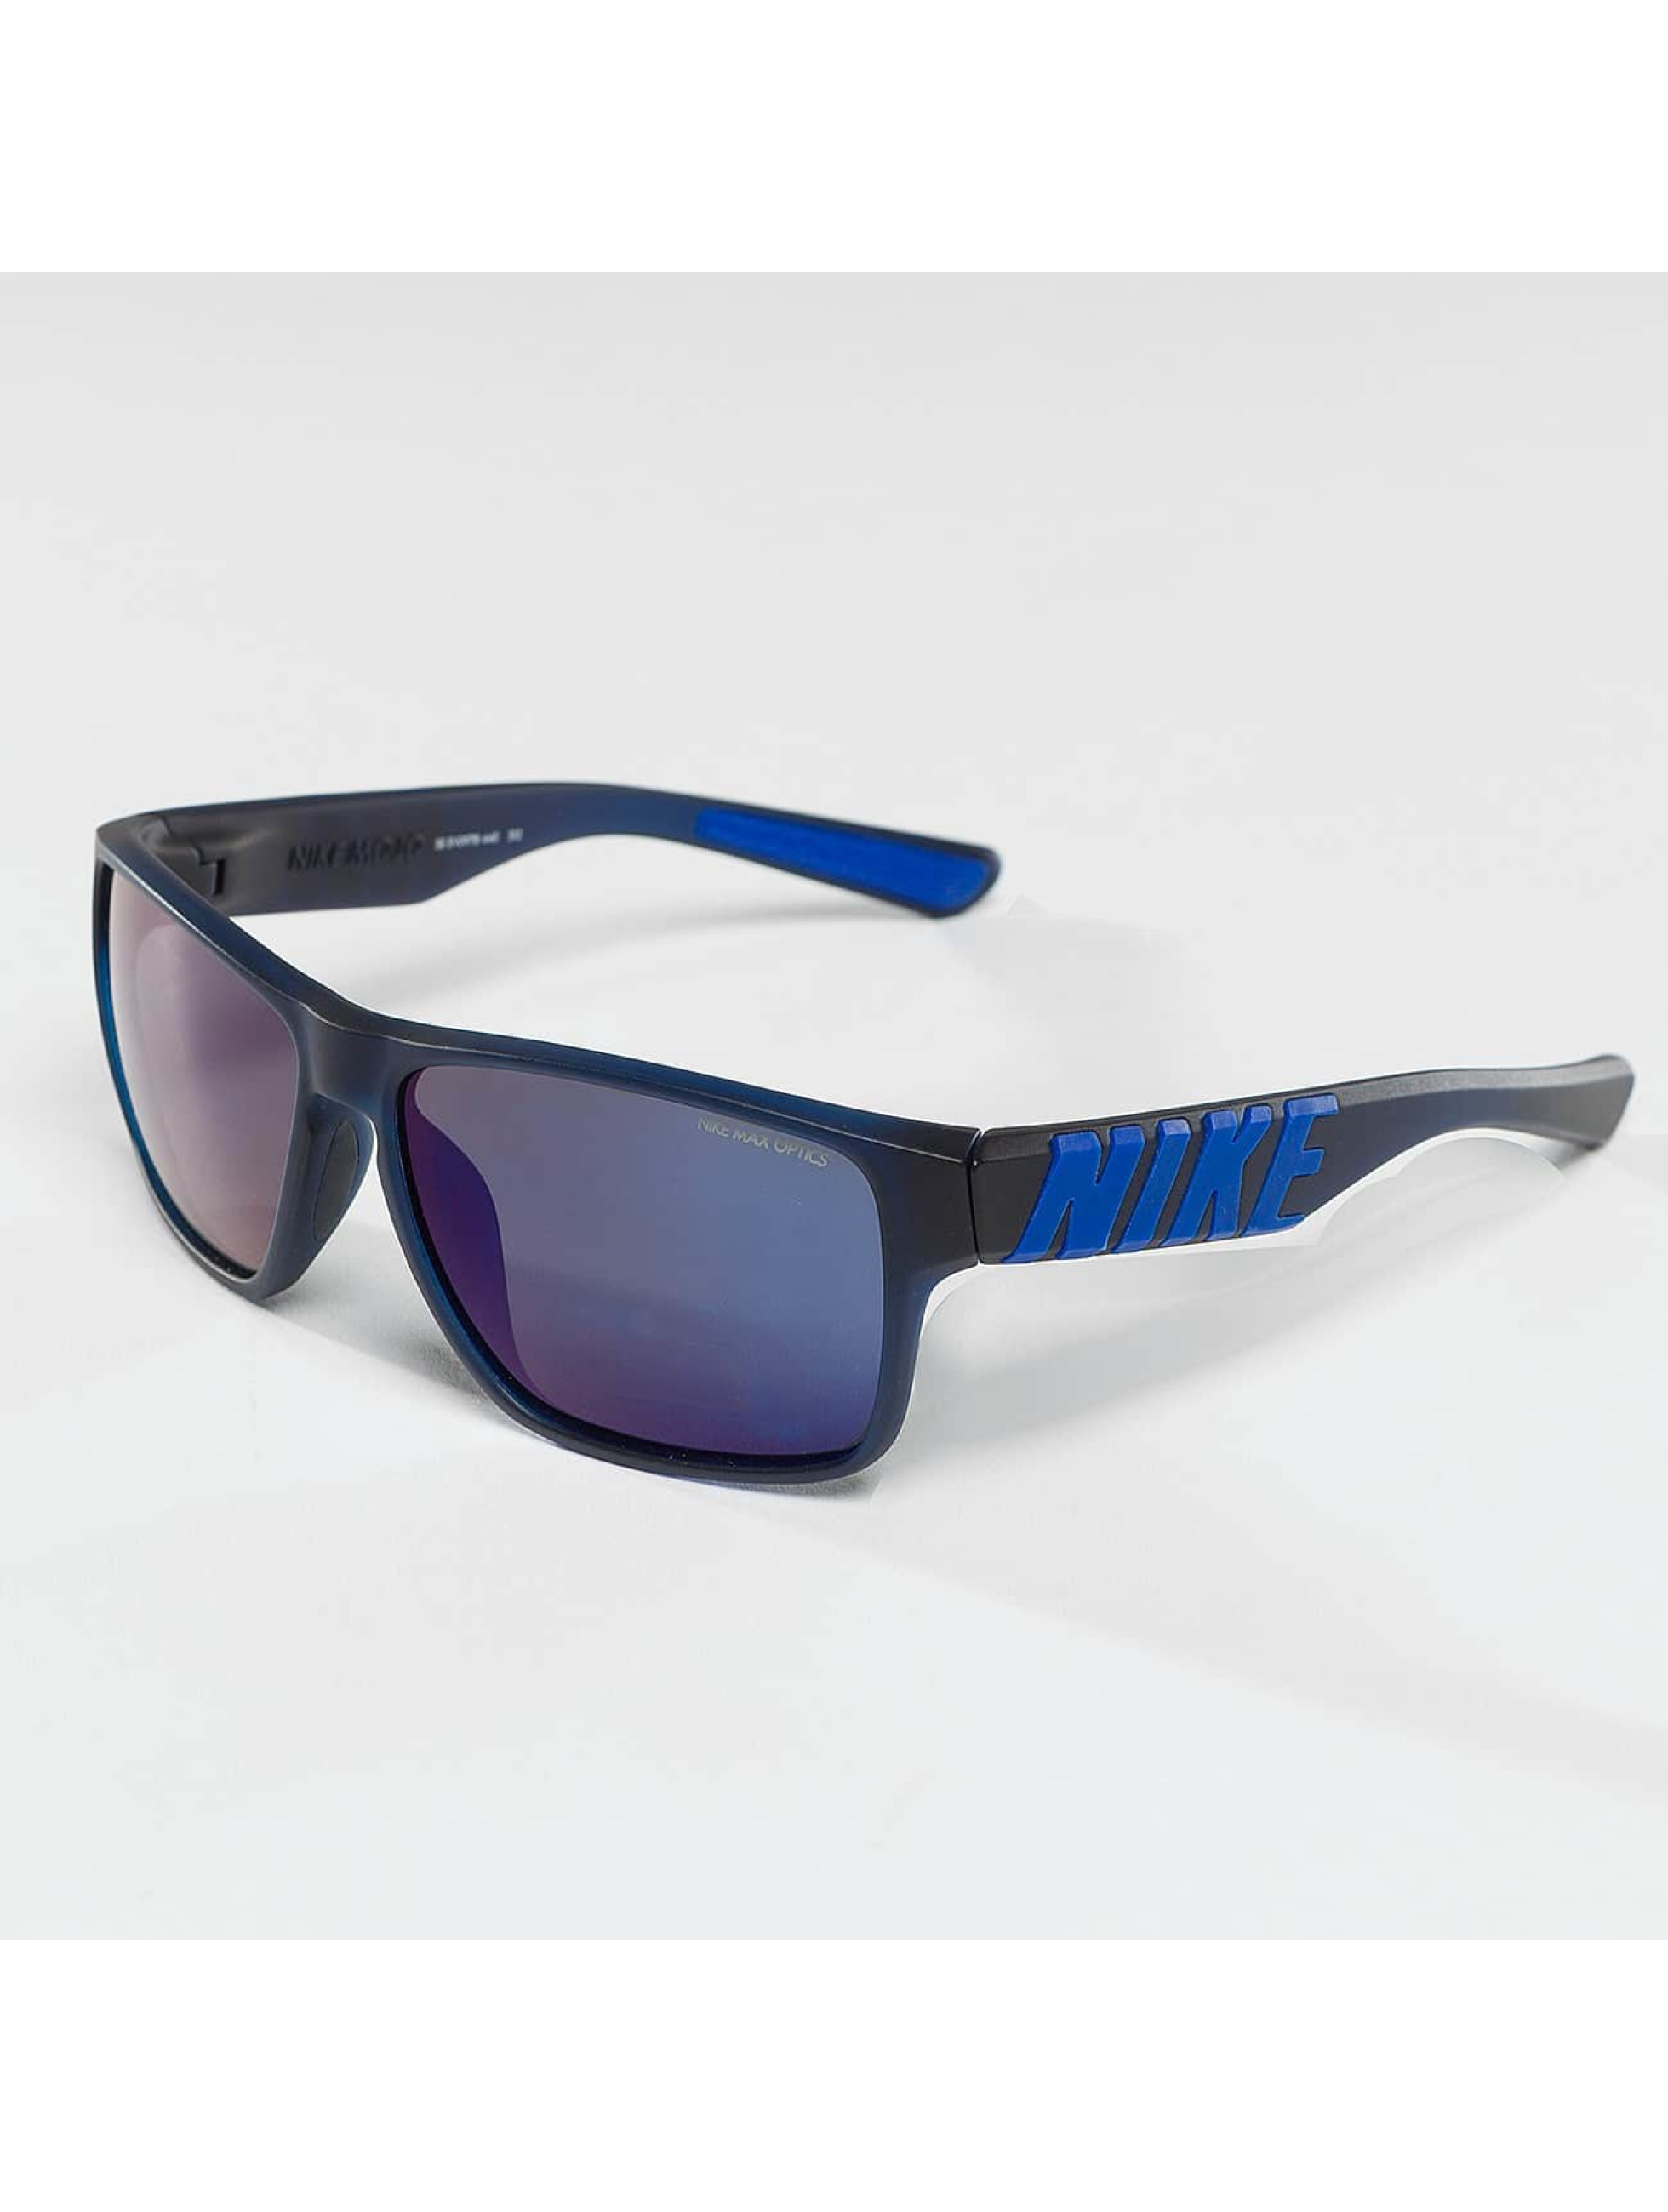 Nike Vision Lunettes de soleil Mojo bleu